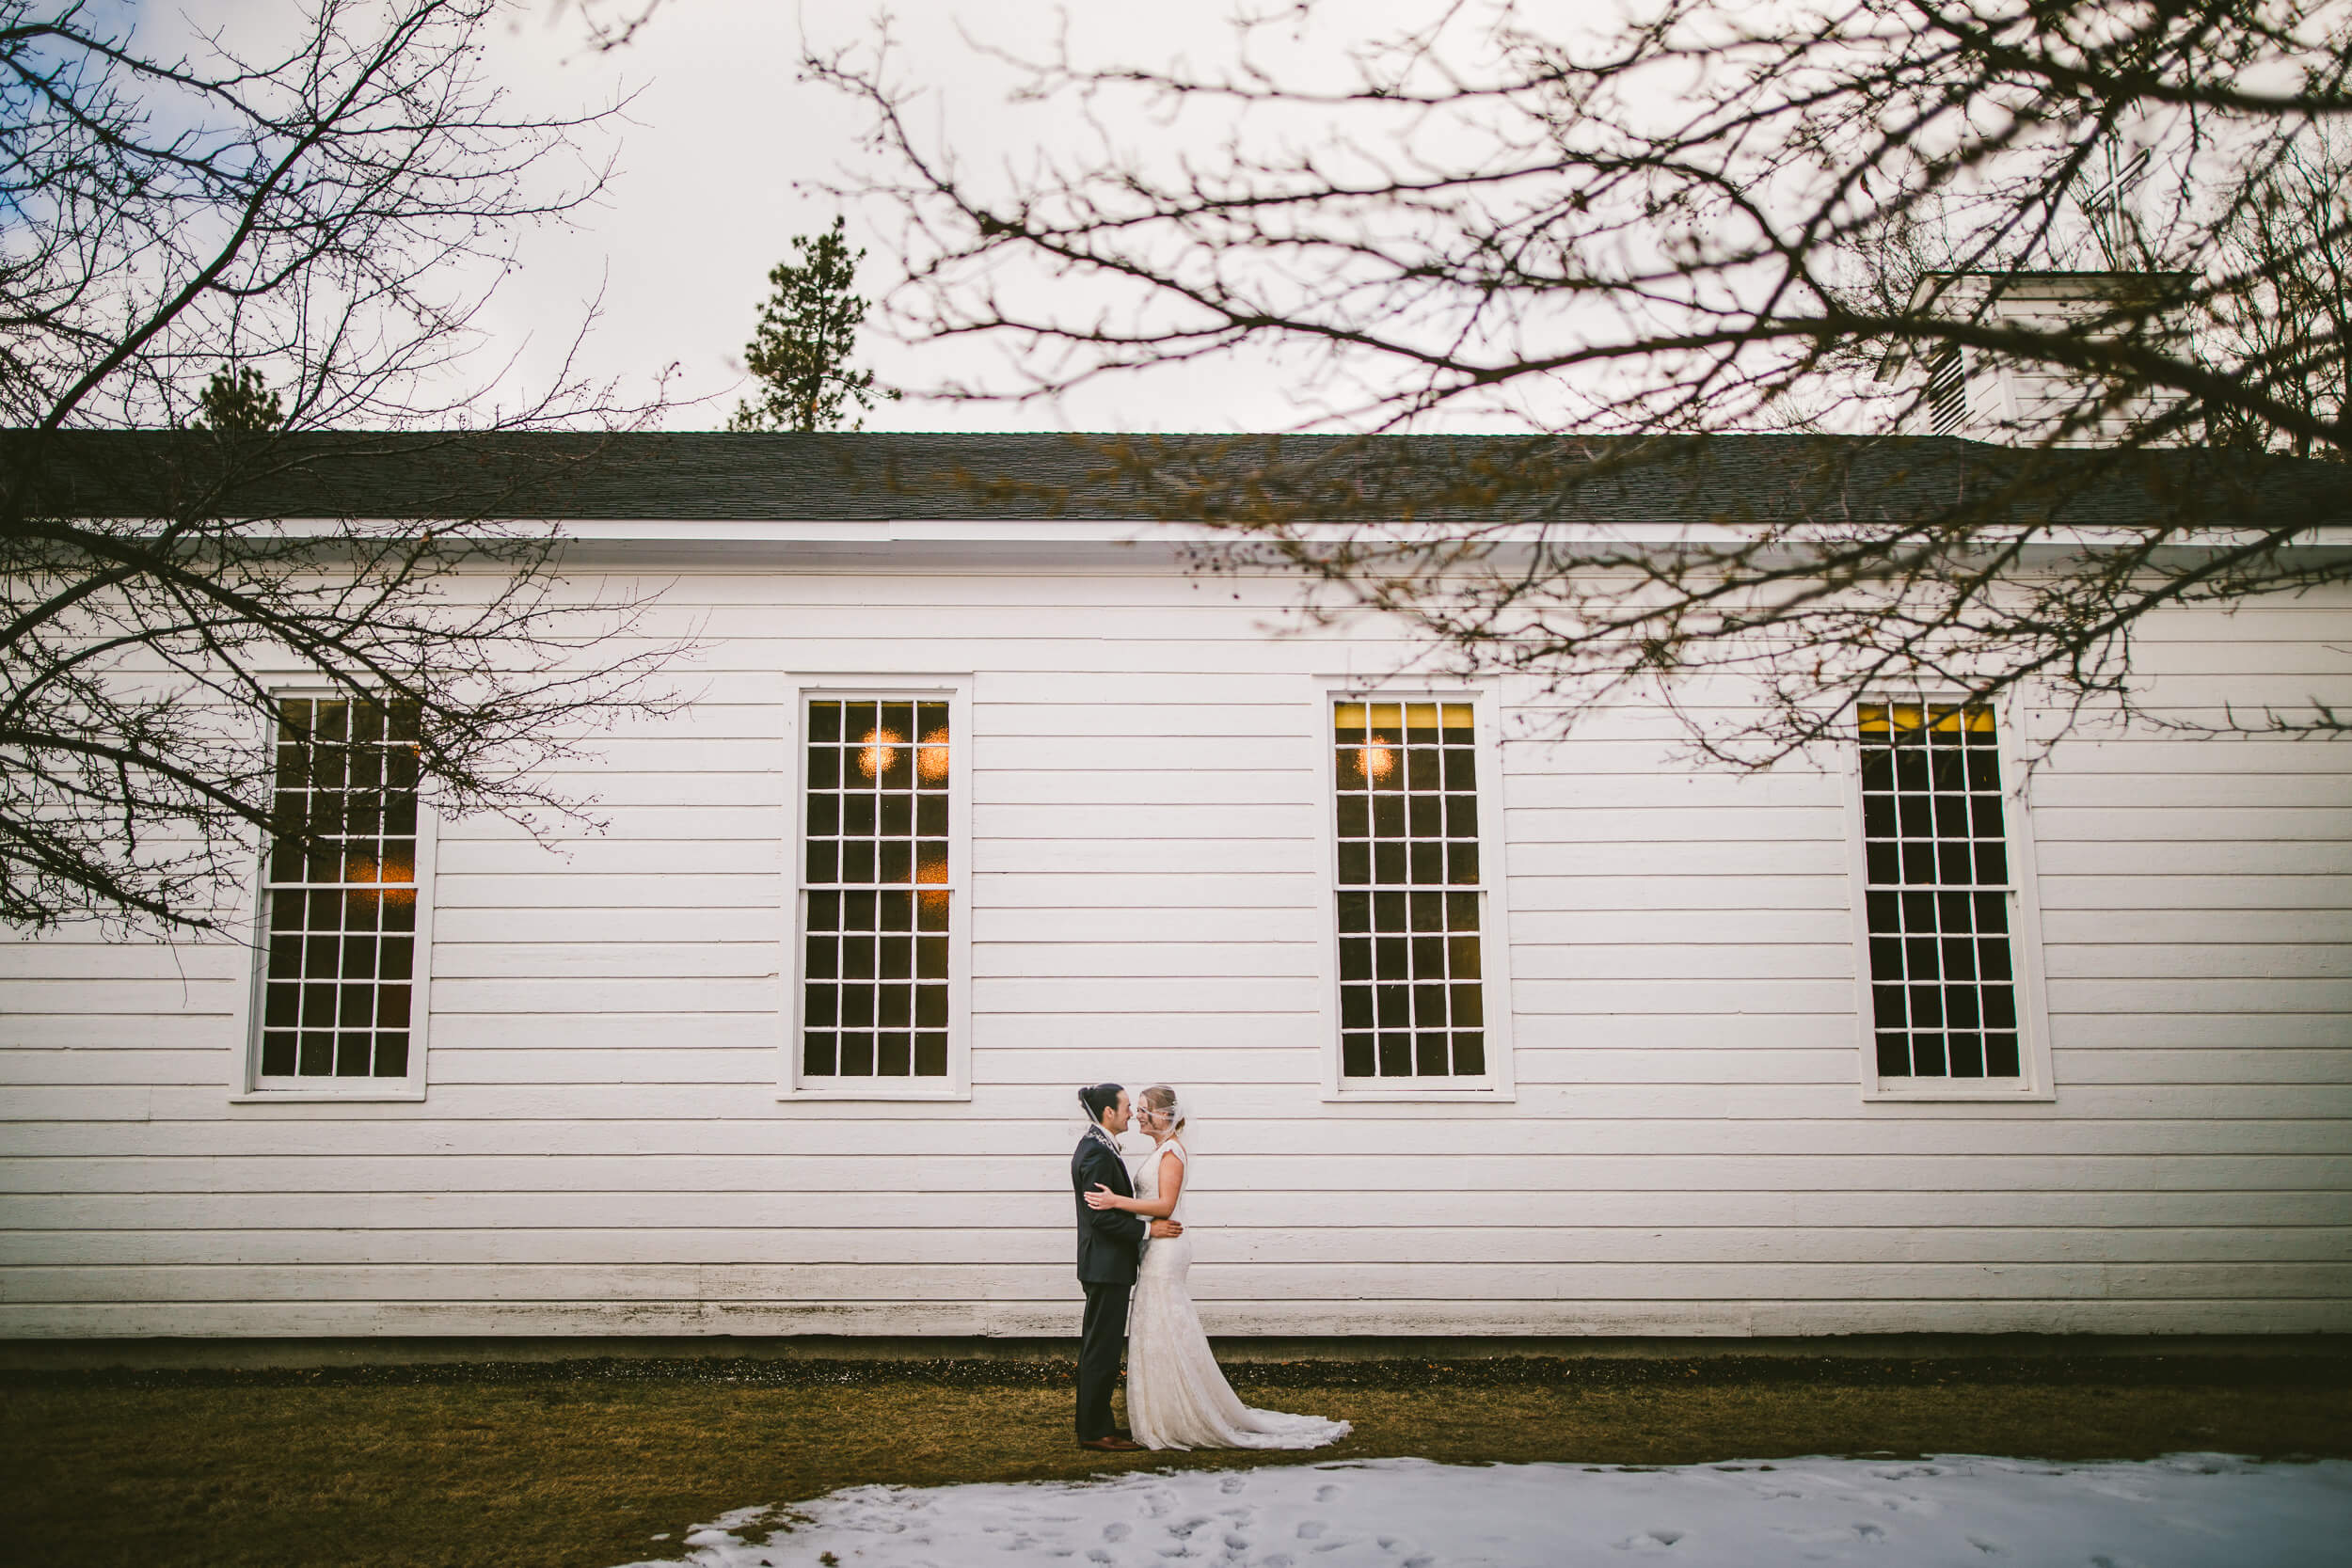 mukogawa winter wedding in spokane (94).jpg